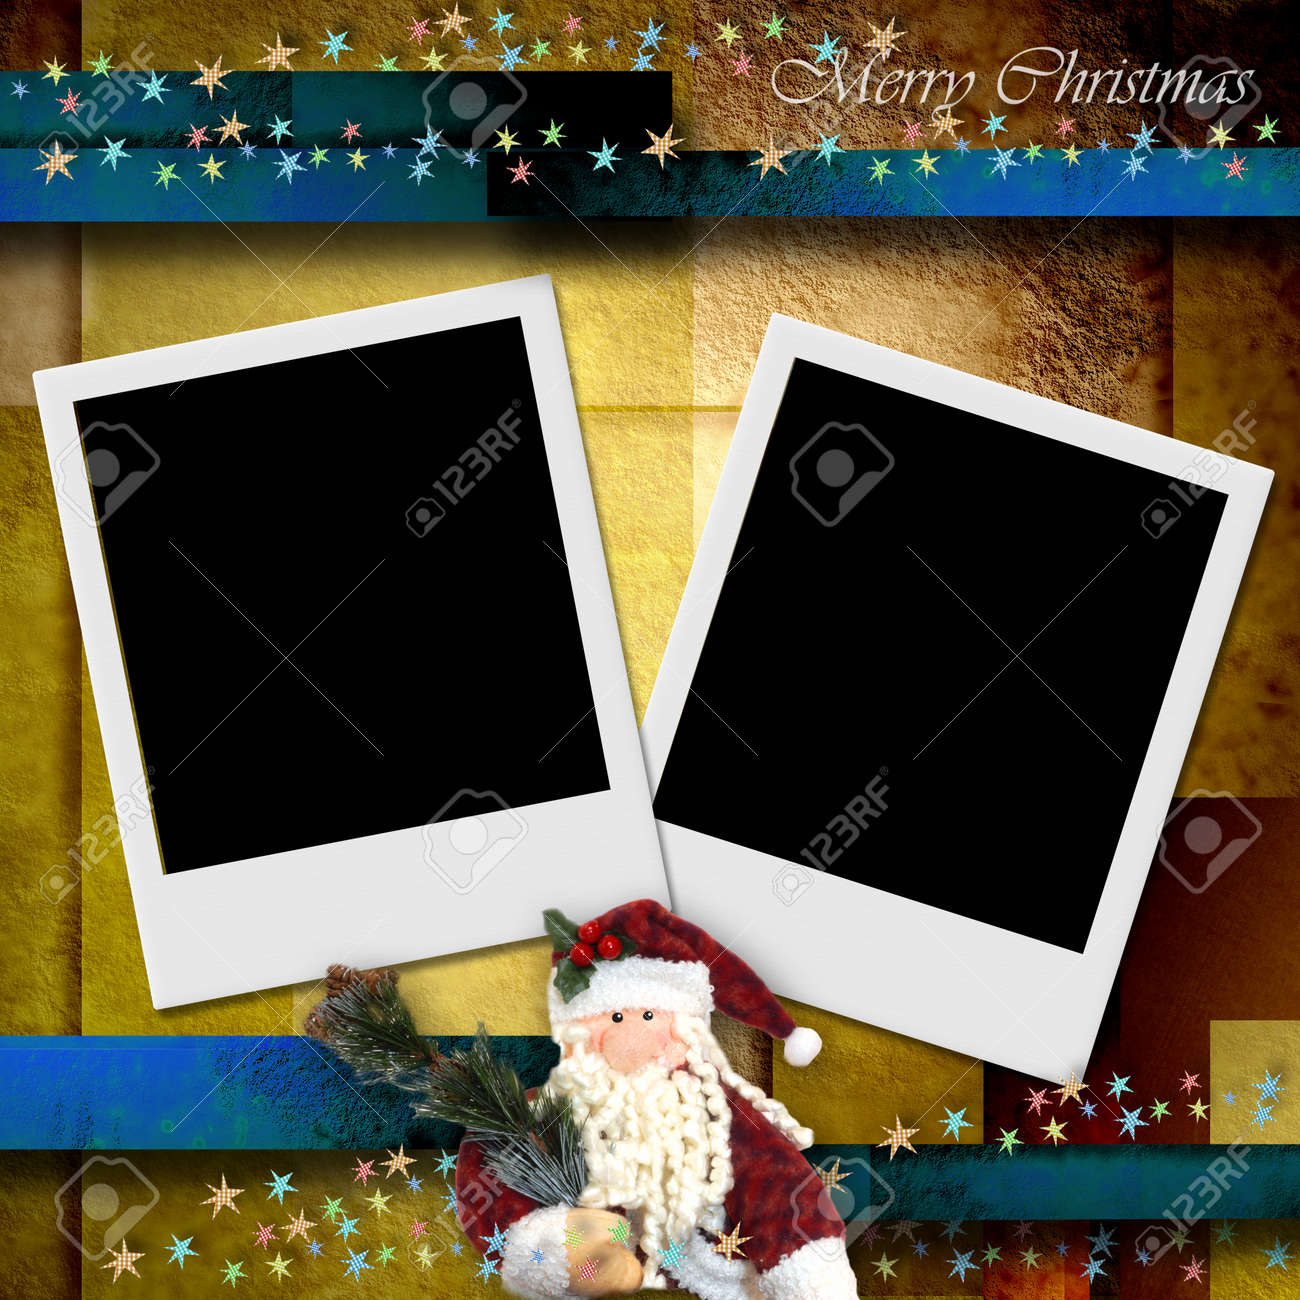 photo frame merry christmas card, empty two photos and Santa Stock Photo - 23560987